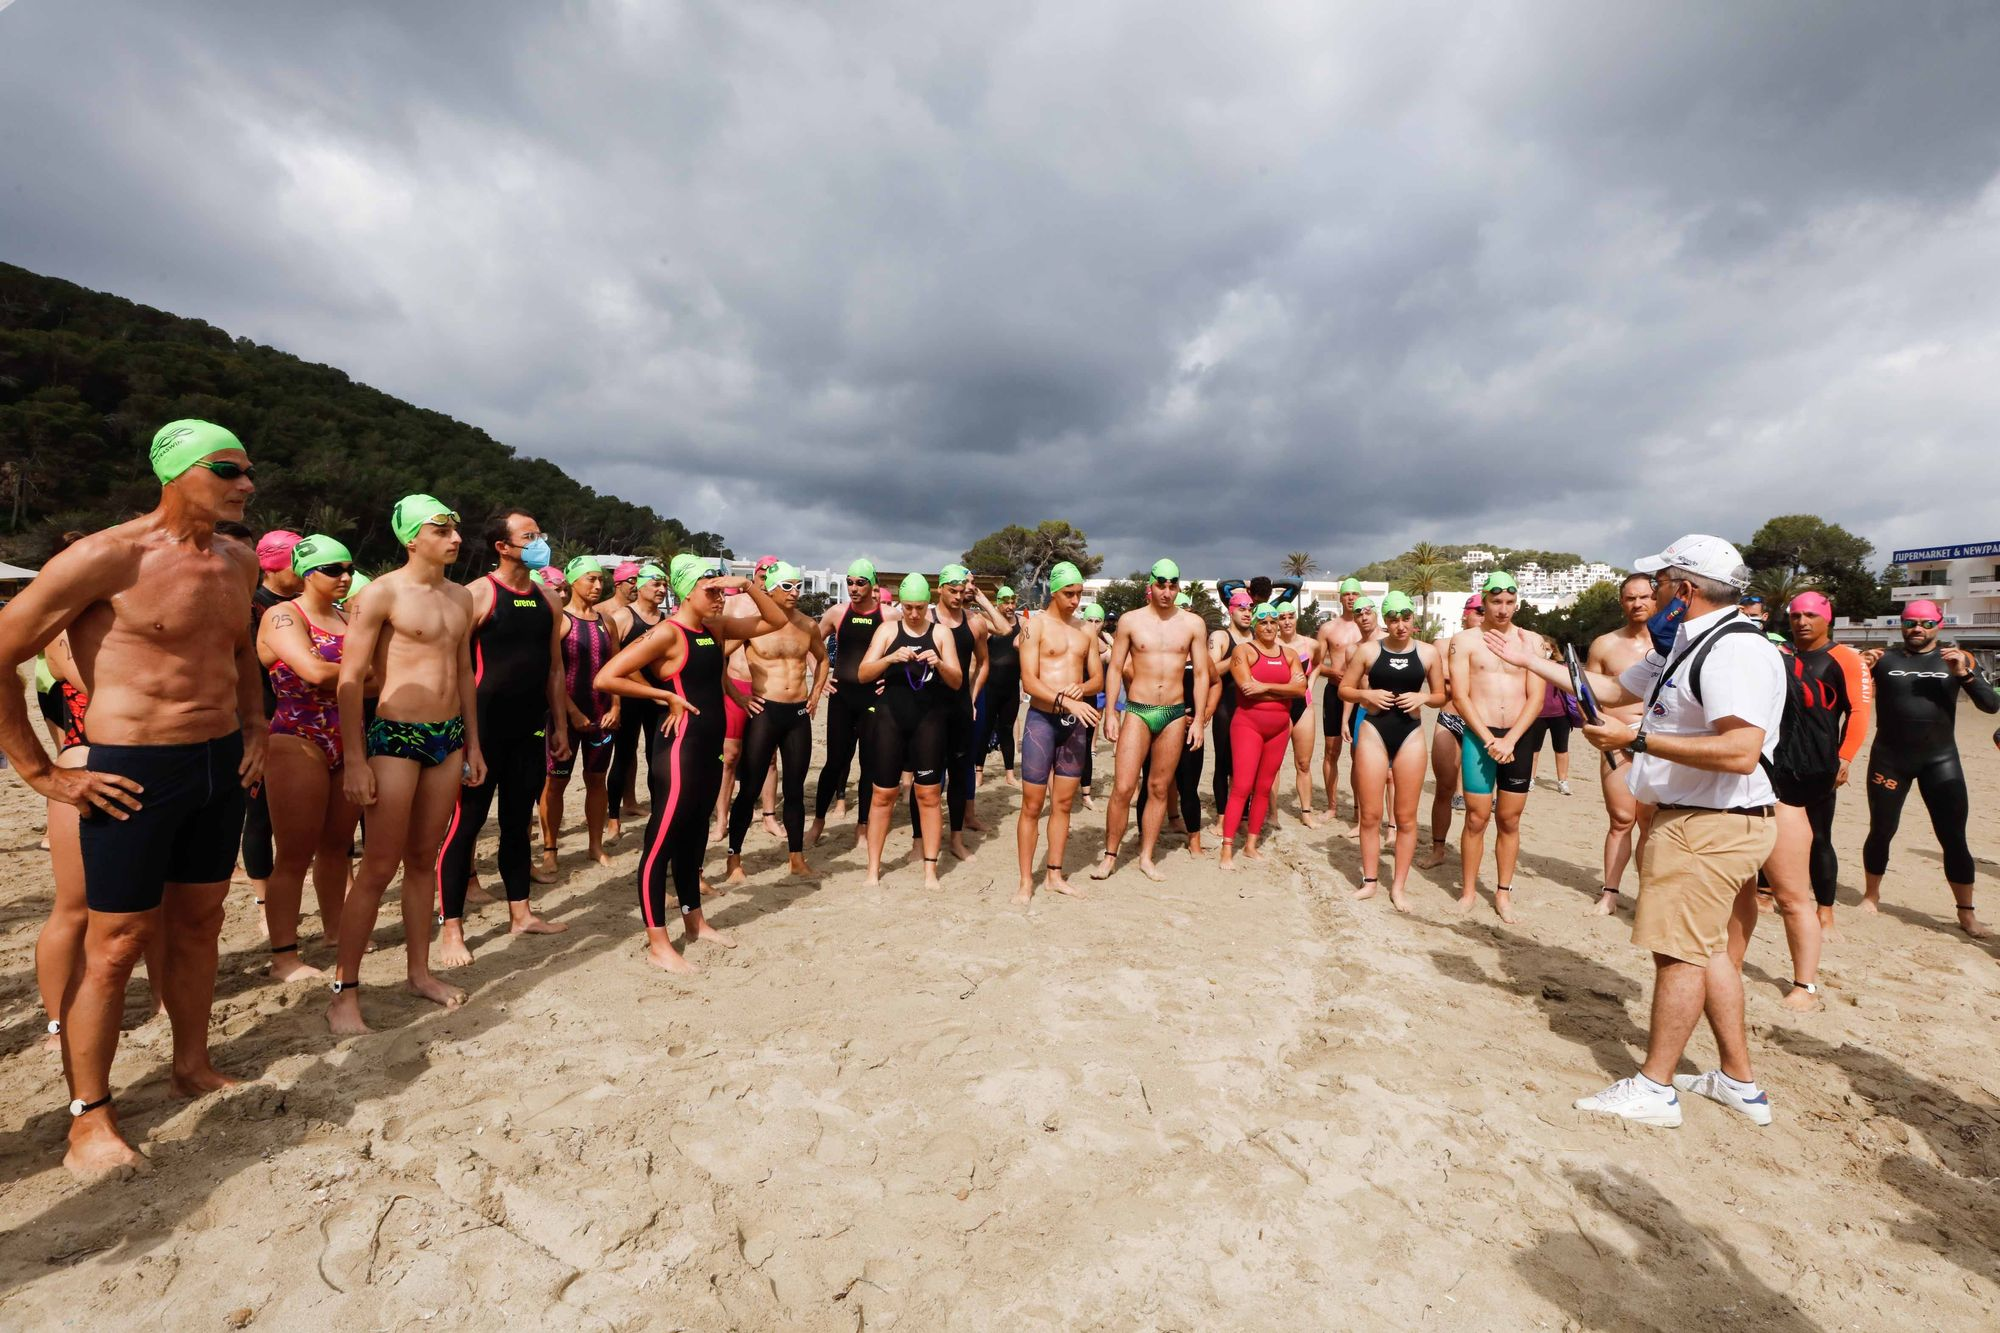 Mini Ultraswim-Copa de España de natación en aguas abiertas